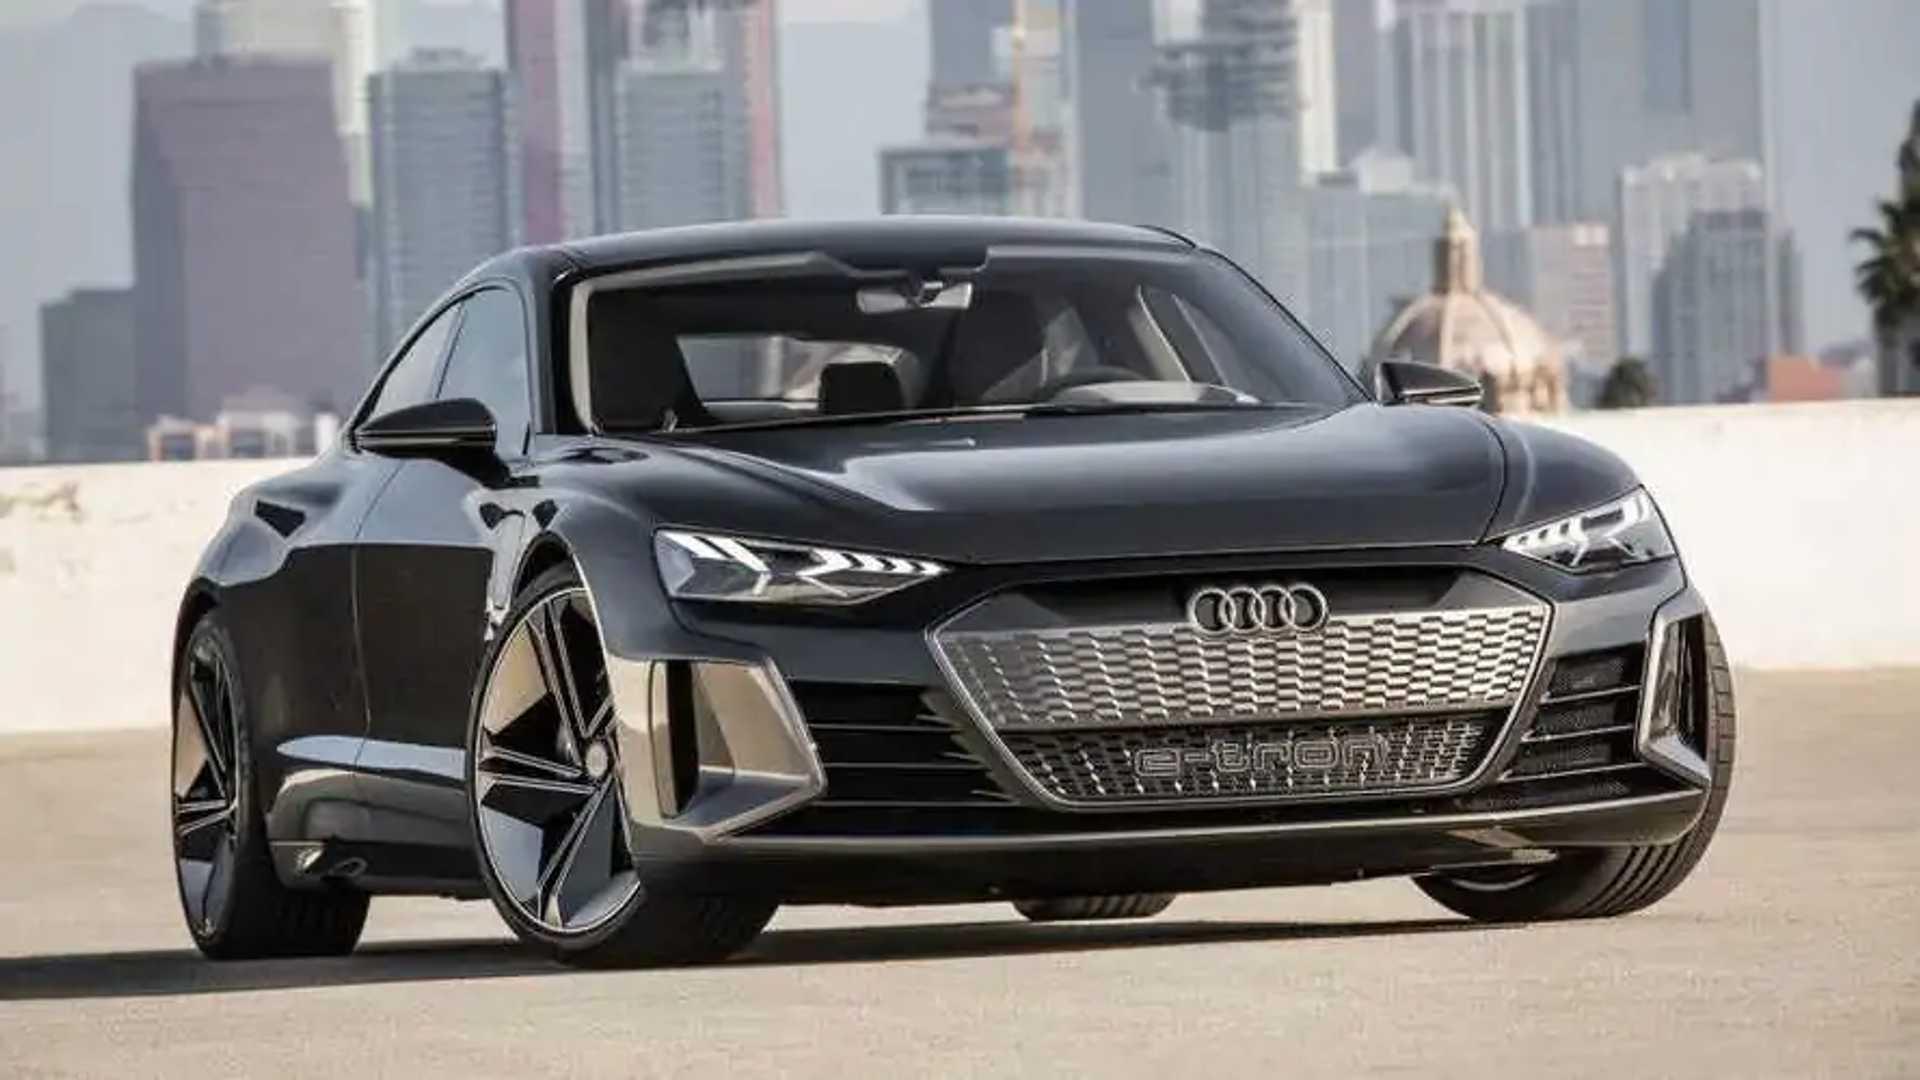 Audi New Car 2021 Release